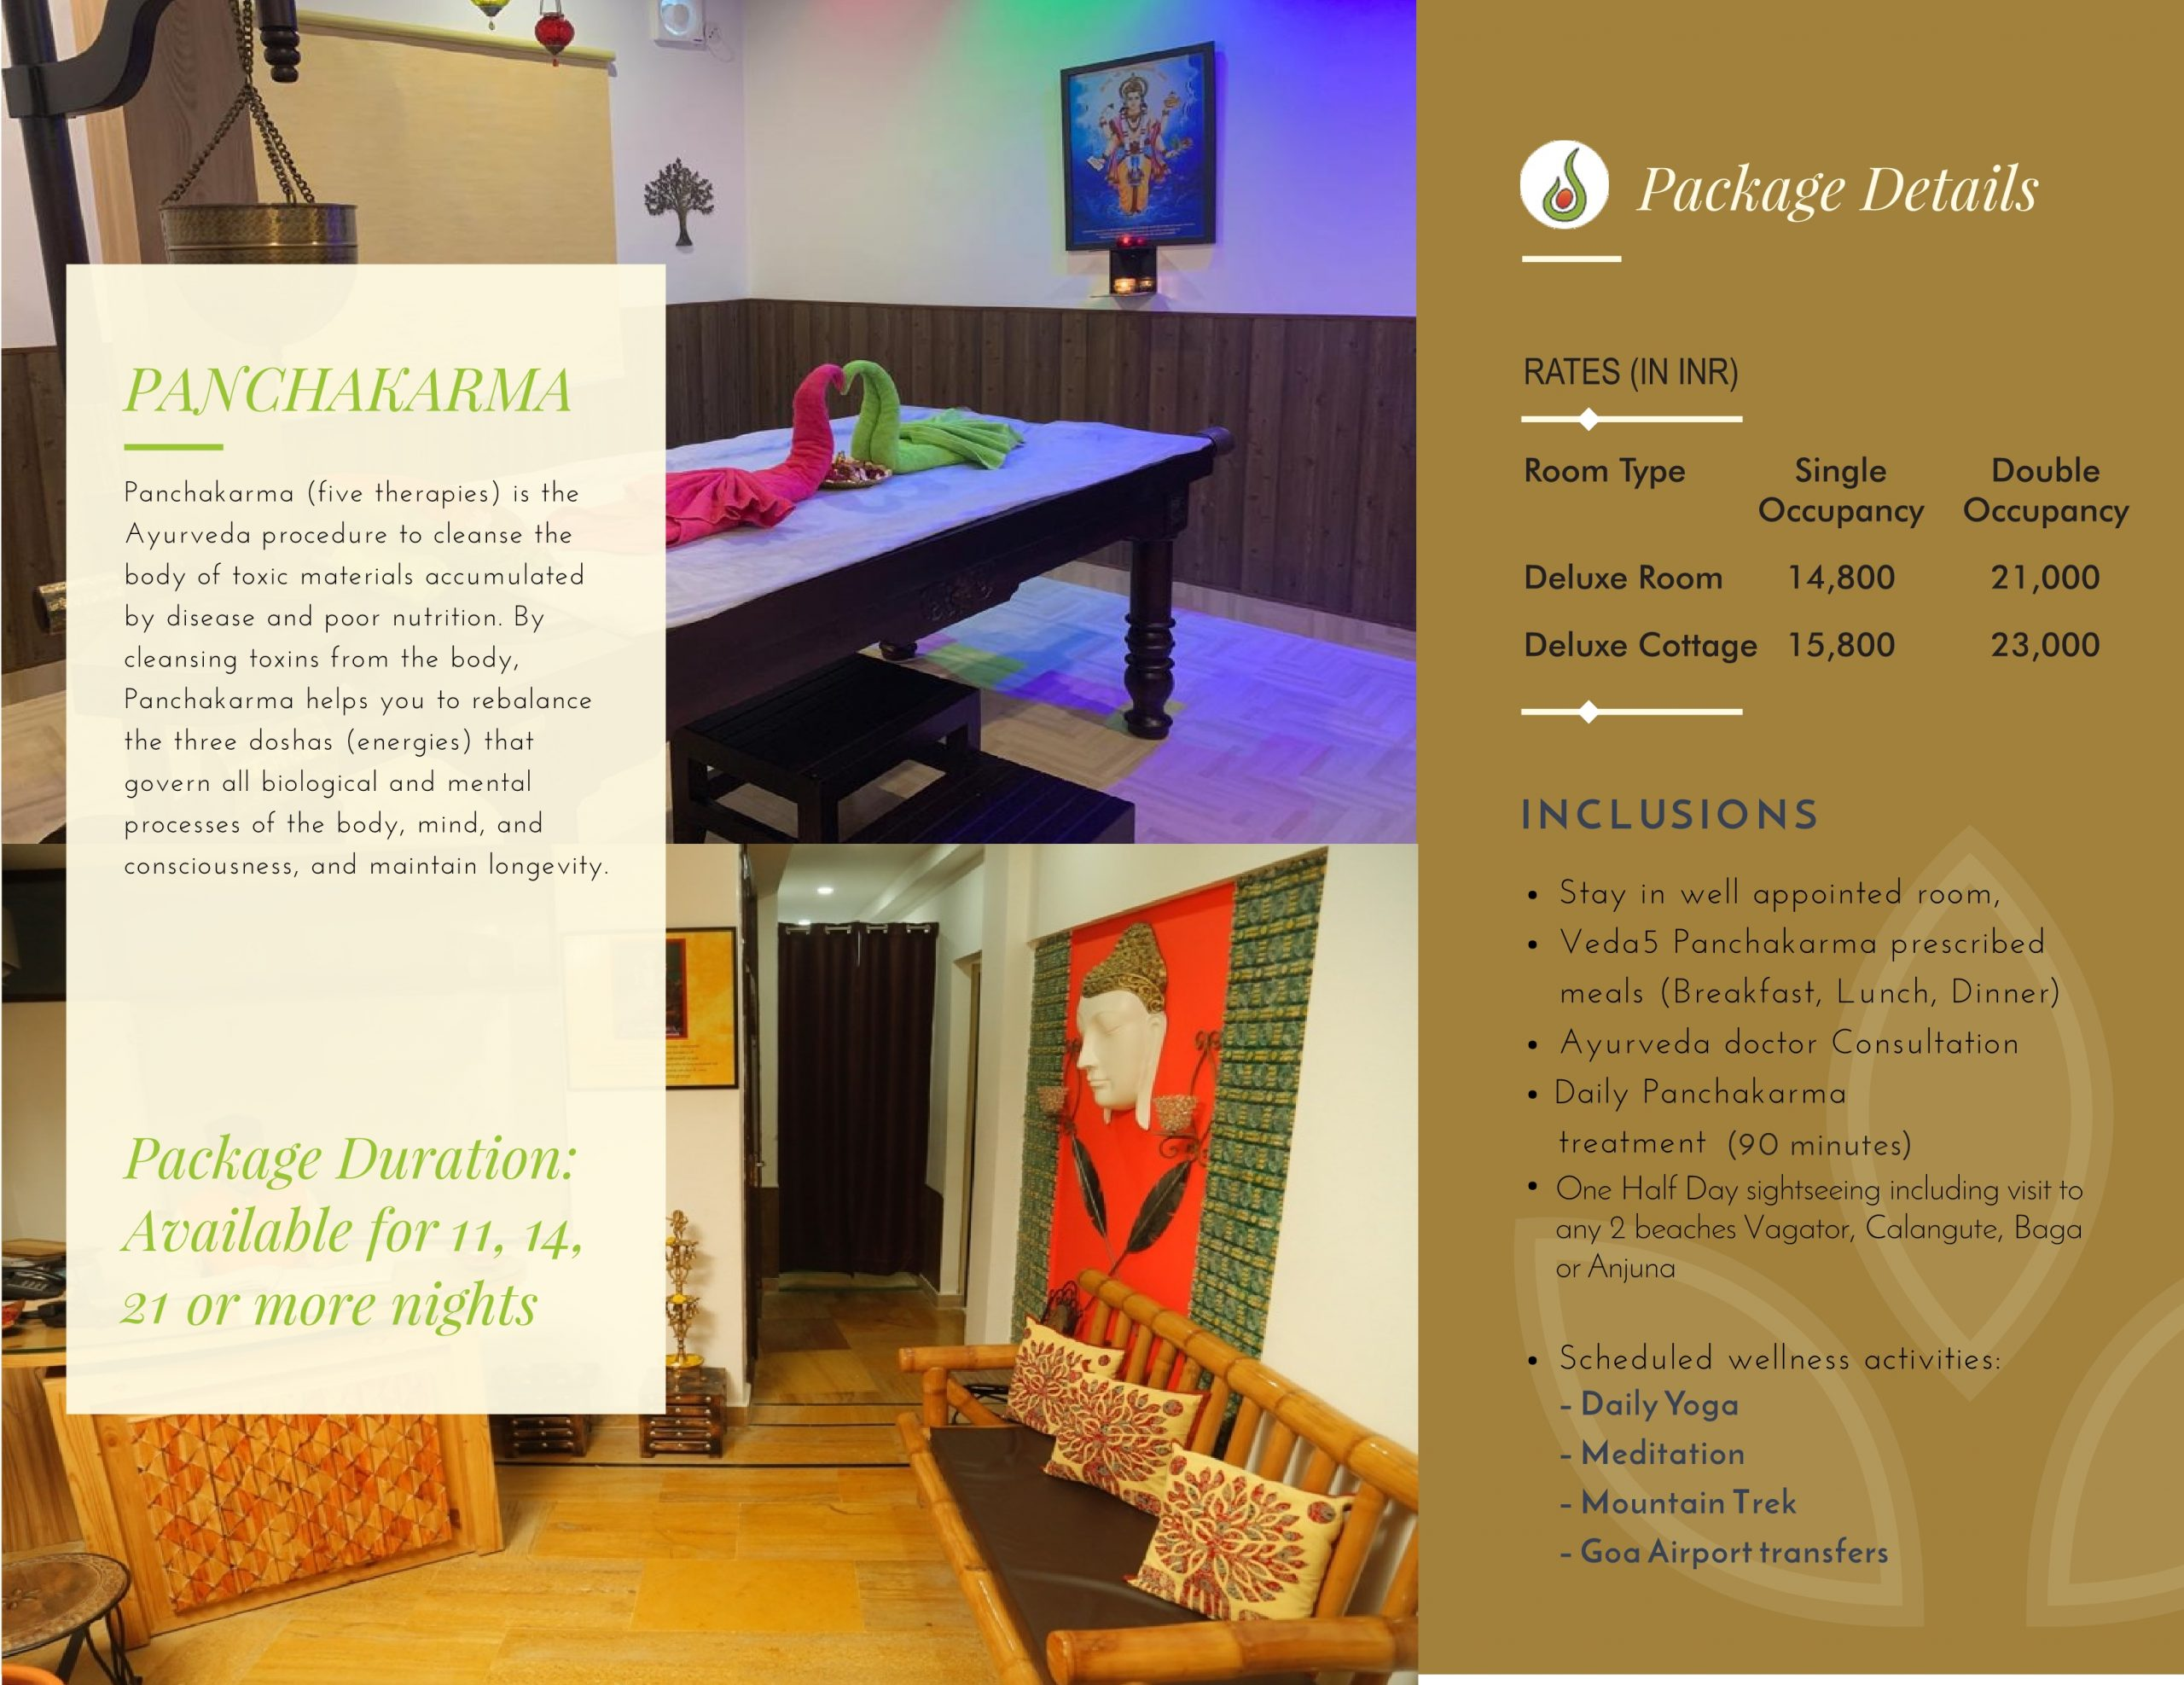 Veda5 Wellness Retreat and Spa in Arambol Goa India for Ayurveda Panchakarma Treatments and Yoga and Hotel Resort for Vacation - 1